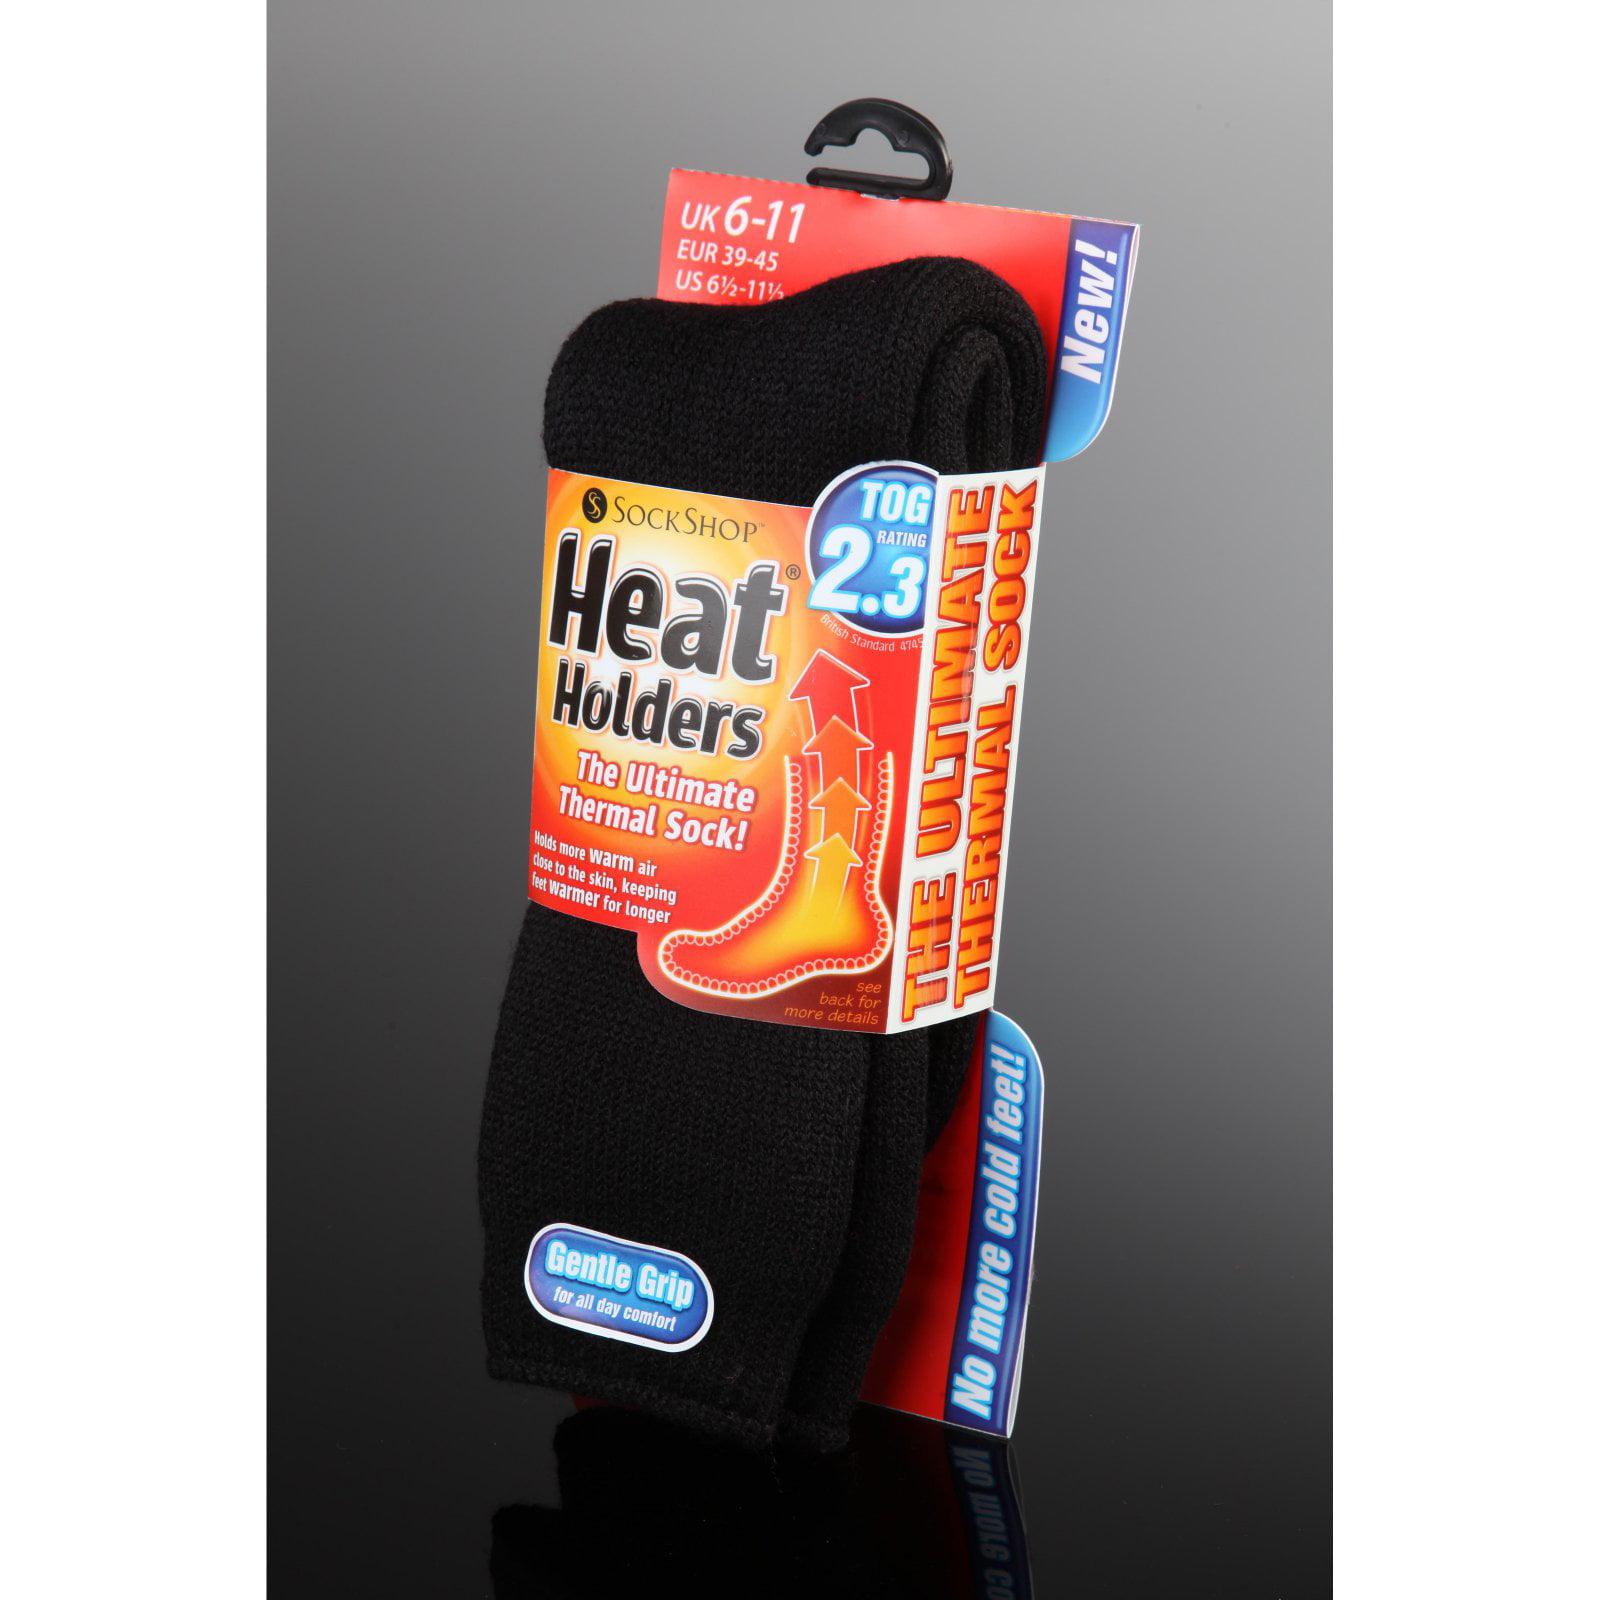 Mens  brushed thermal socks heat machine guaranteed warmth size 6-11